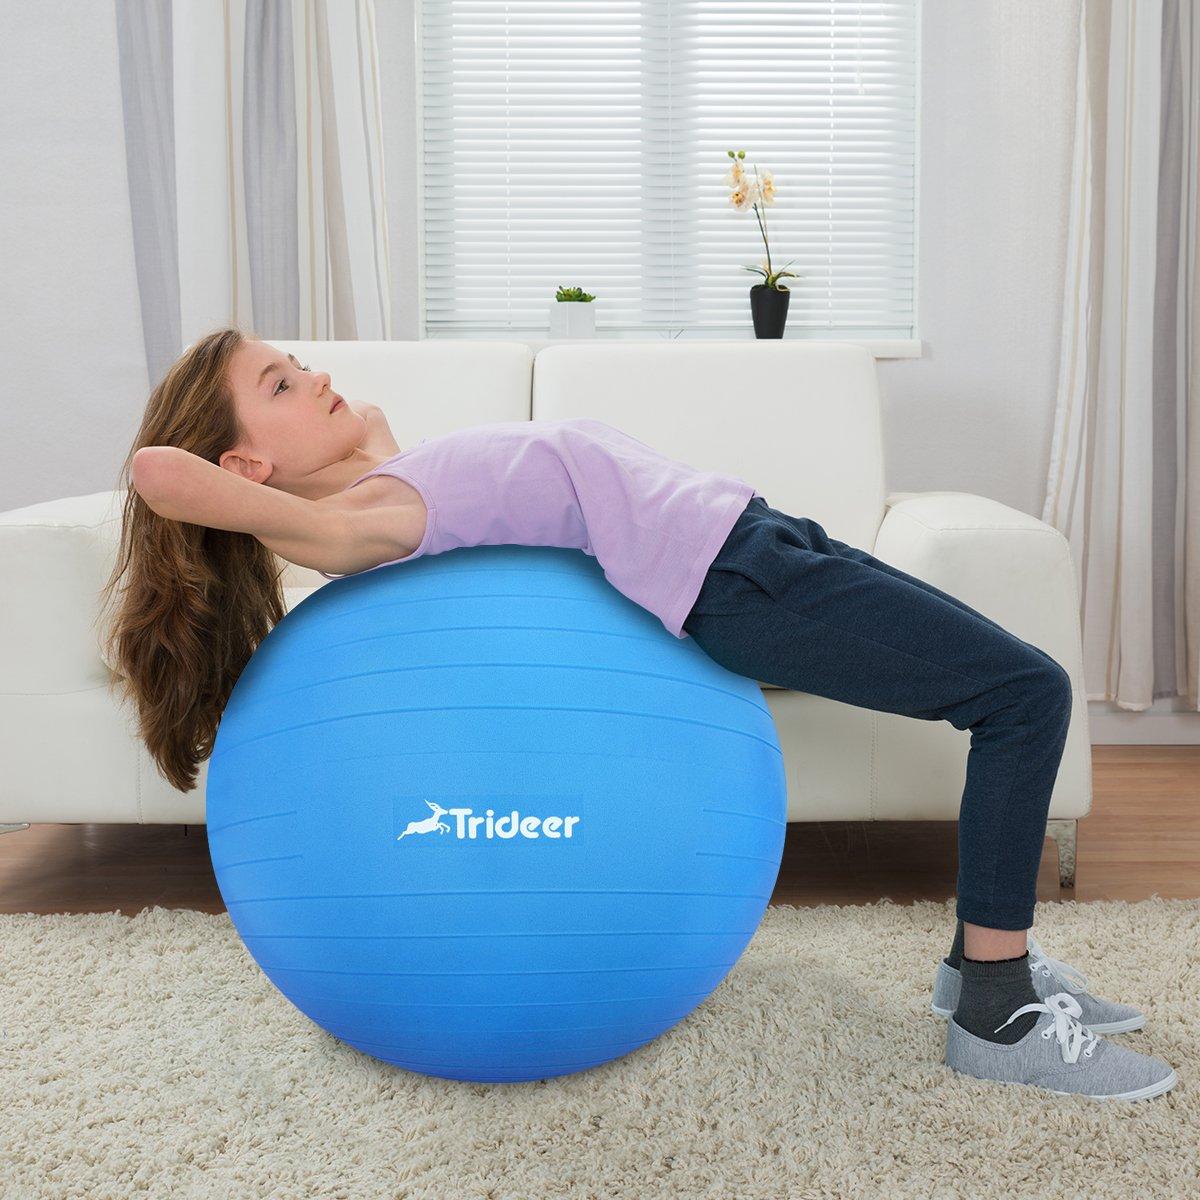 Trideer 45-85cm Exercise Ball, Birthing Ball, Ball Chair, Yoga Pilate Fitness Balance Ball with Pump Plug Kit, Anti-Slip & Anti-Burst (Dark Blue, 65cm) by Trideer (Image #8)